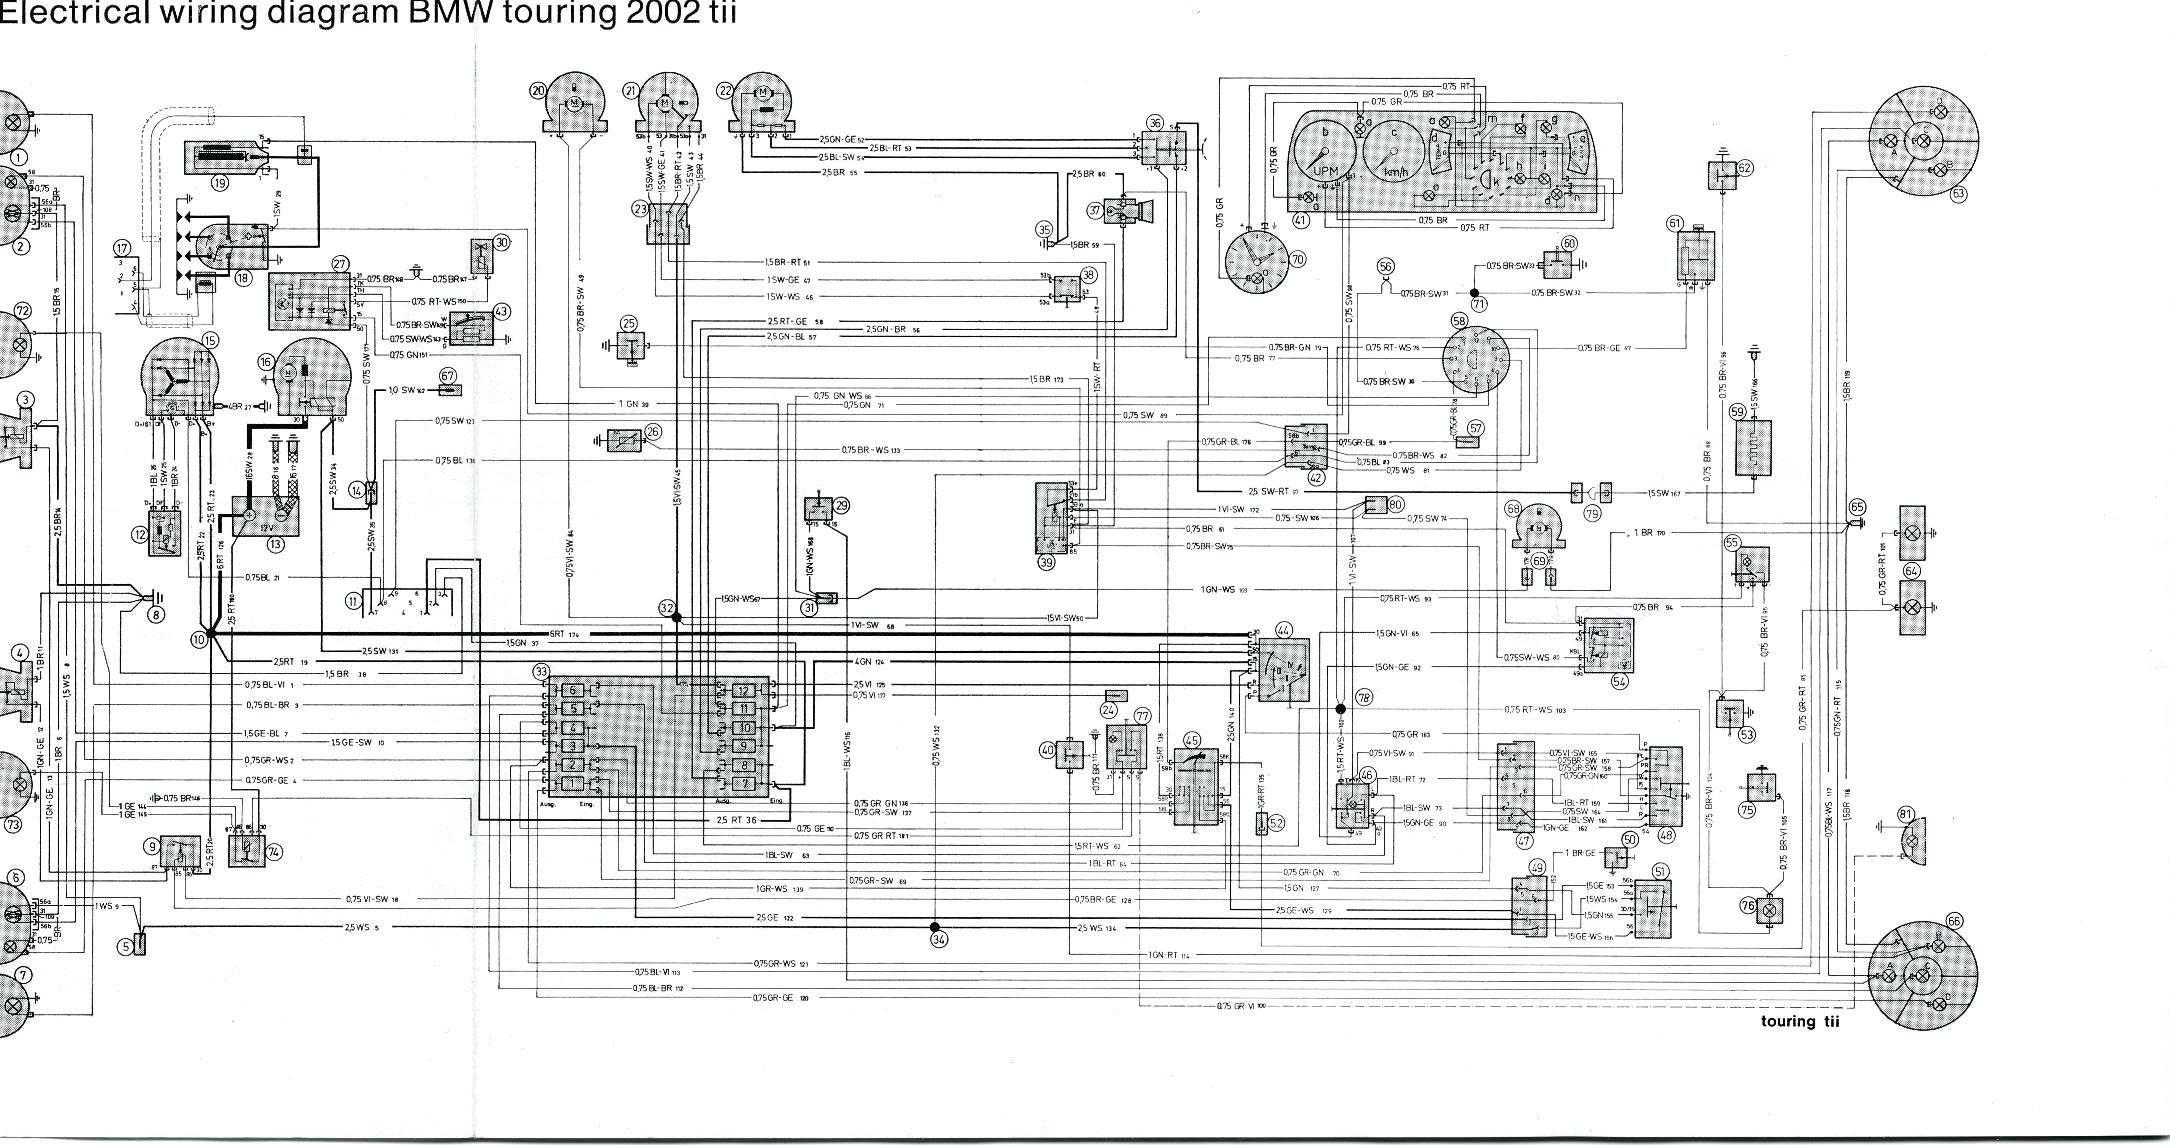 medium resolution of new bmw e46 seat wiring diagram diagram diagramtemplatenew bmw e46 seat wiring diagram diagram diagramtemplate diagramsample